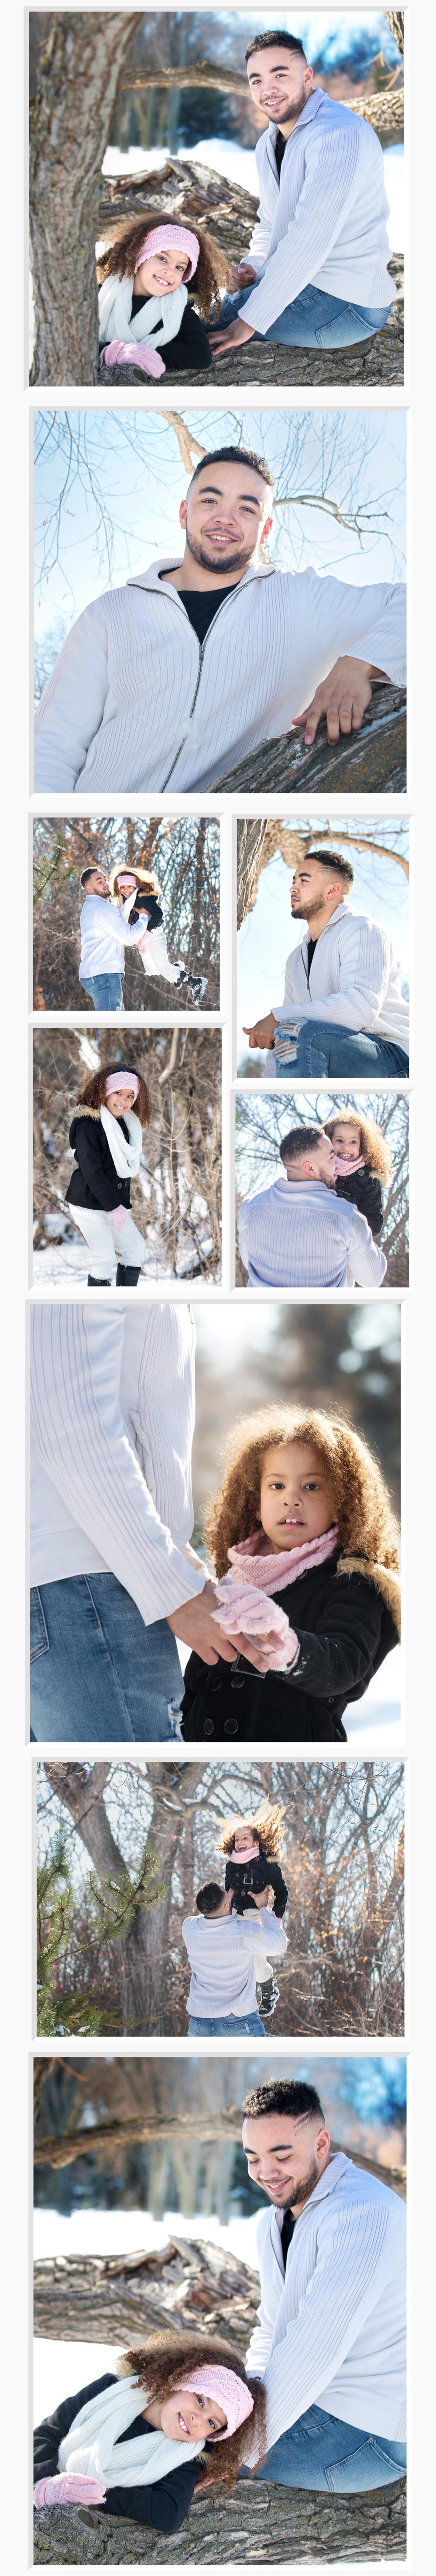 siblings-winter-photos-free-lense-photo-02.jpg